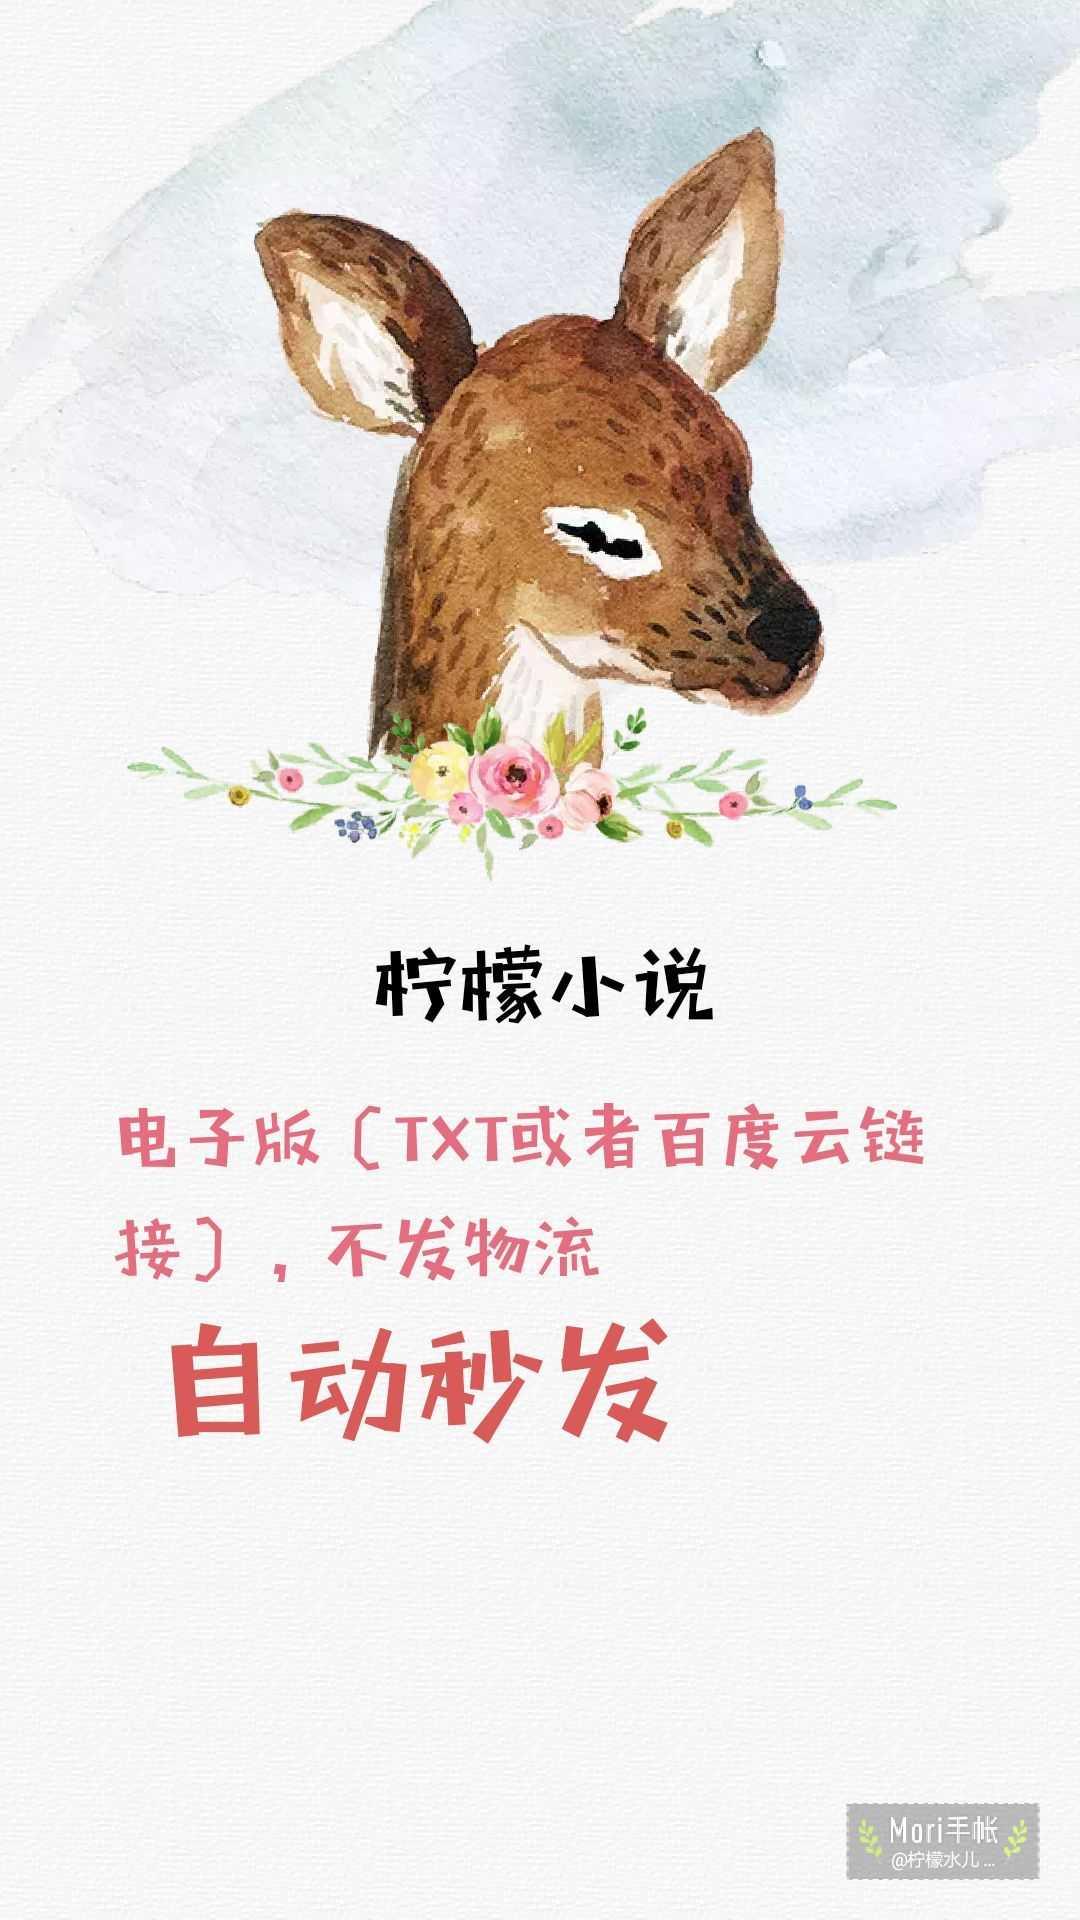 Проснись, я не знаю, люблю, круто, Энн кролик, Тан Яньчэн, Глава ладони любви пакет конец